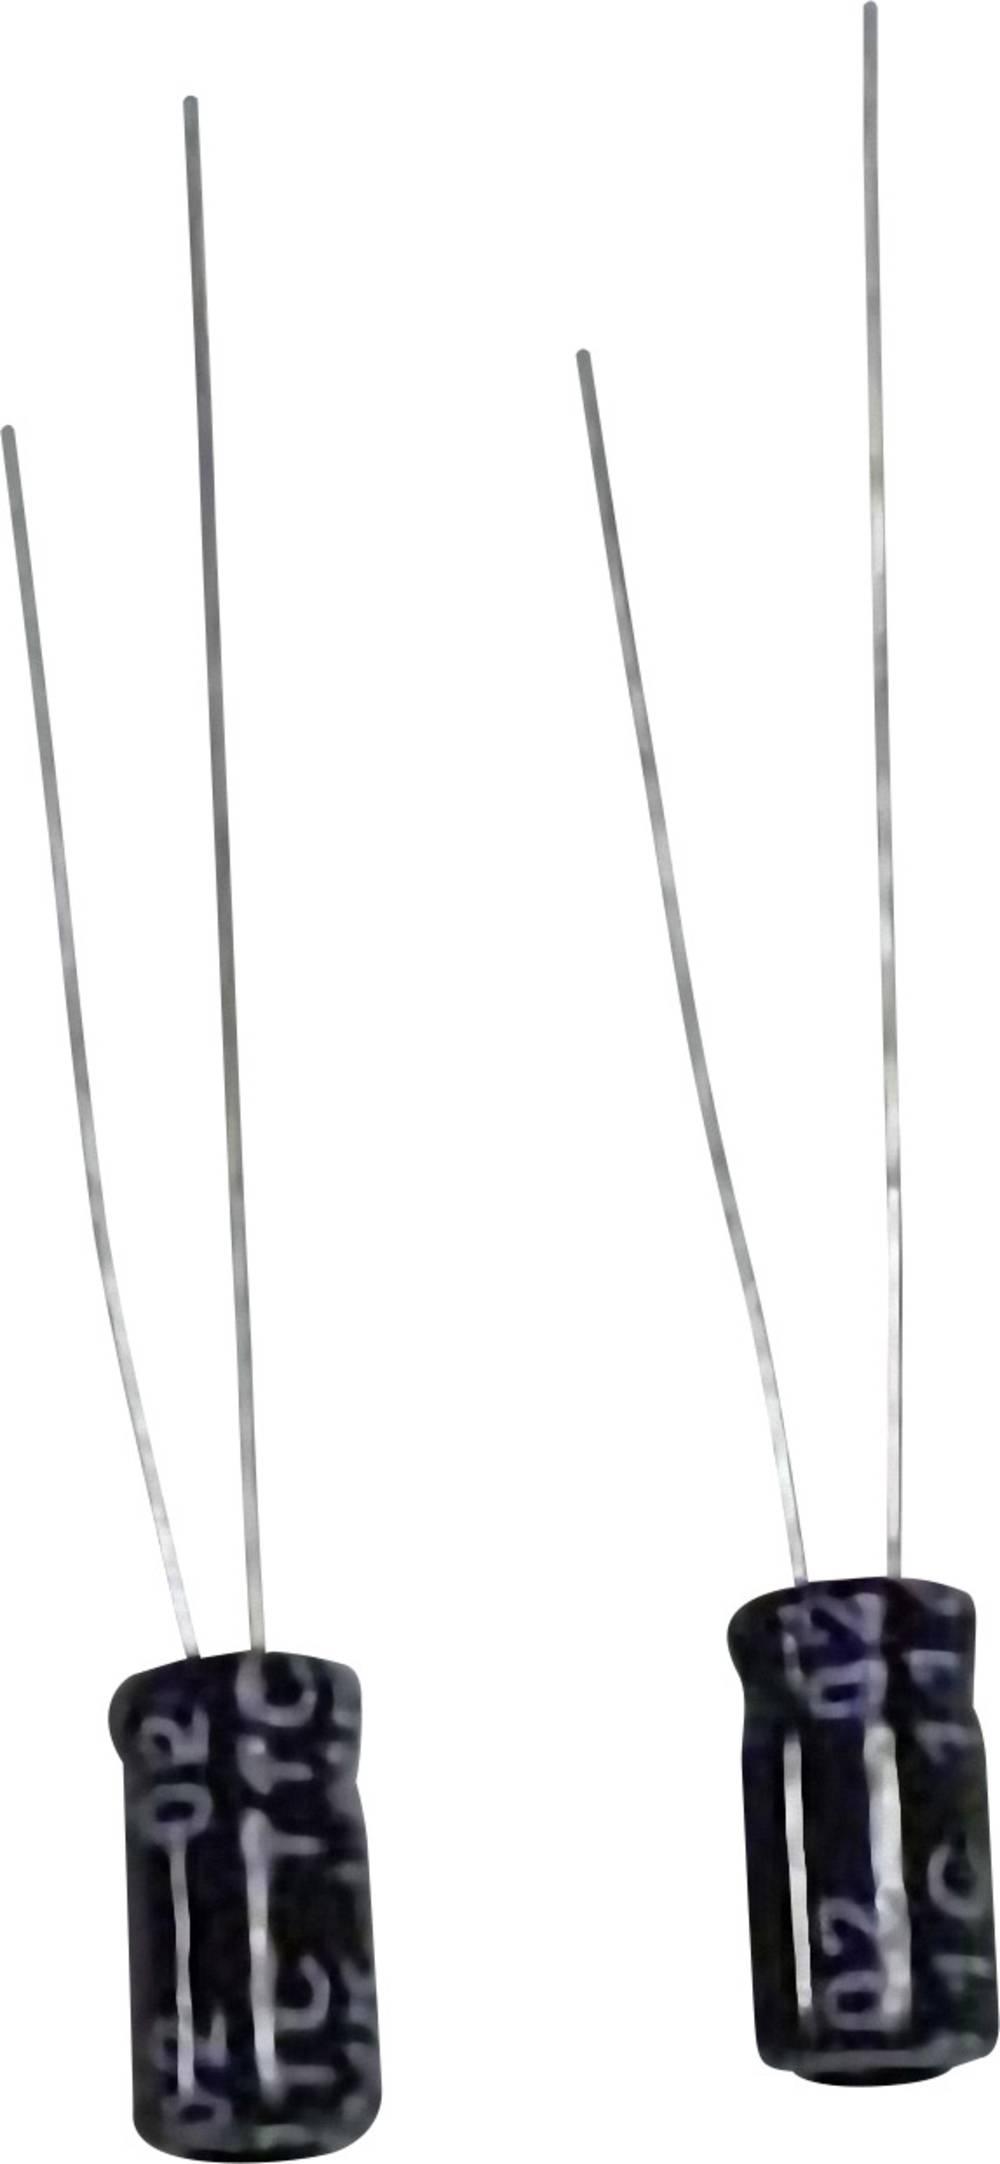 Subminijaturni elektrolitski kondenzator (OxV) 5 mm x 7 mm raster 2 mm 33F 25 V